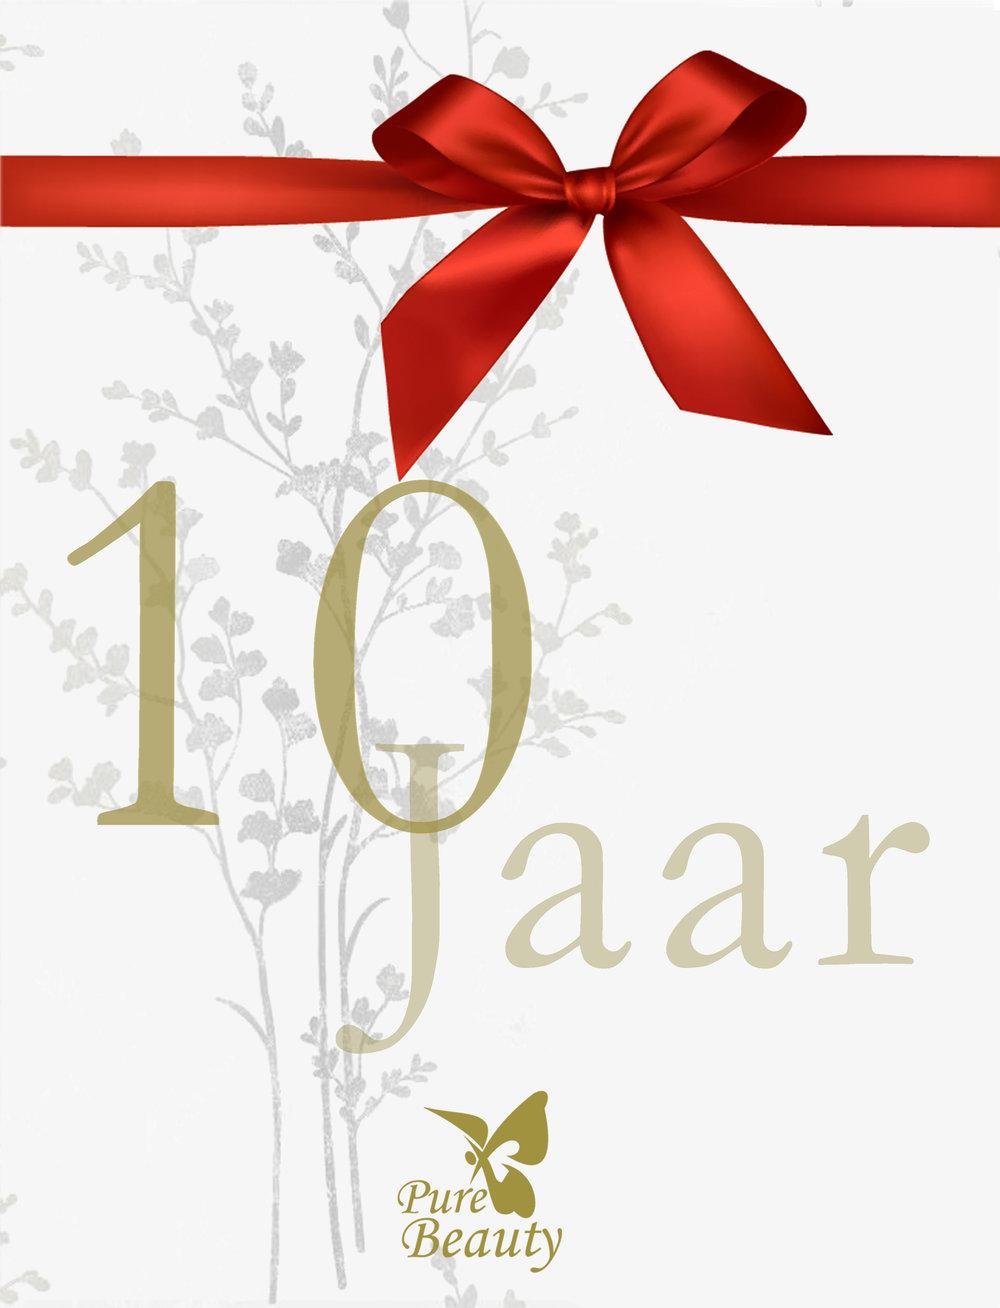 website 10 jaar (2).jpg